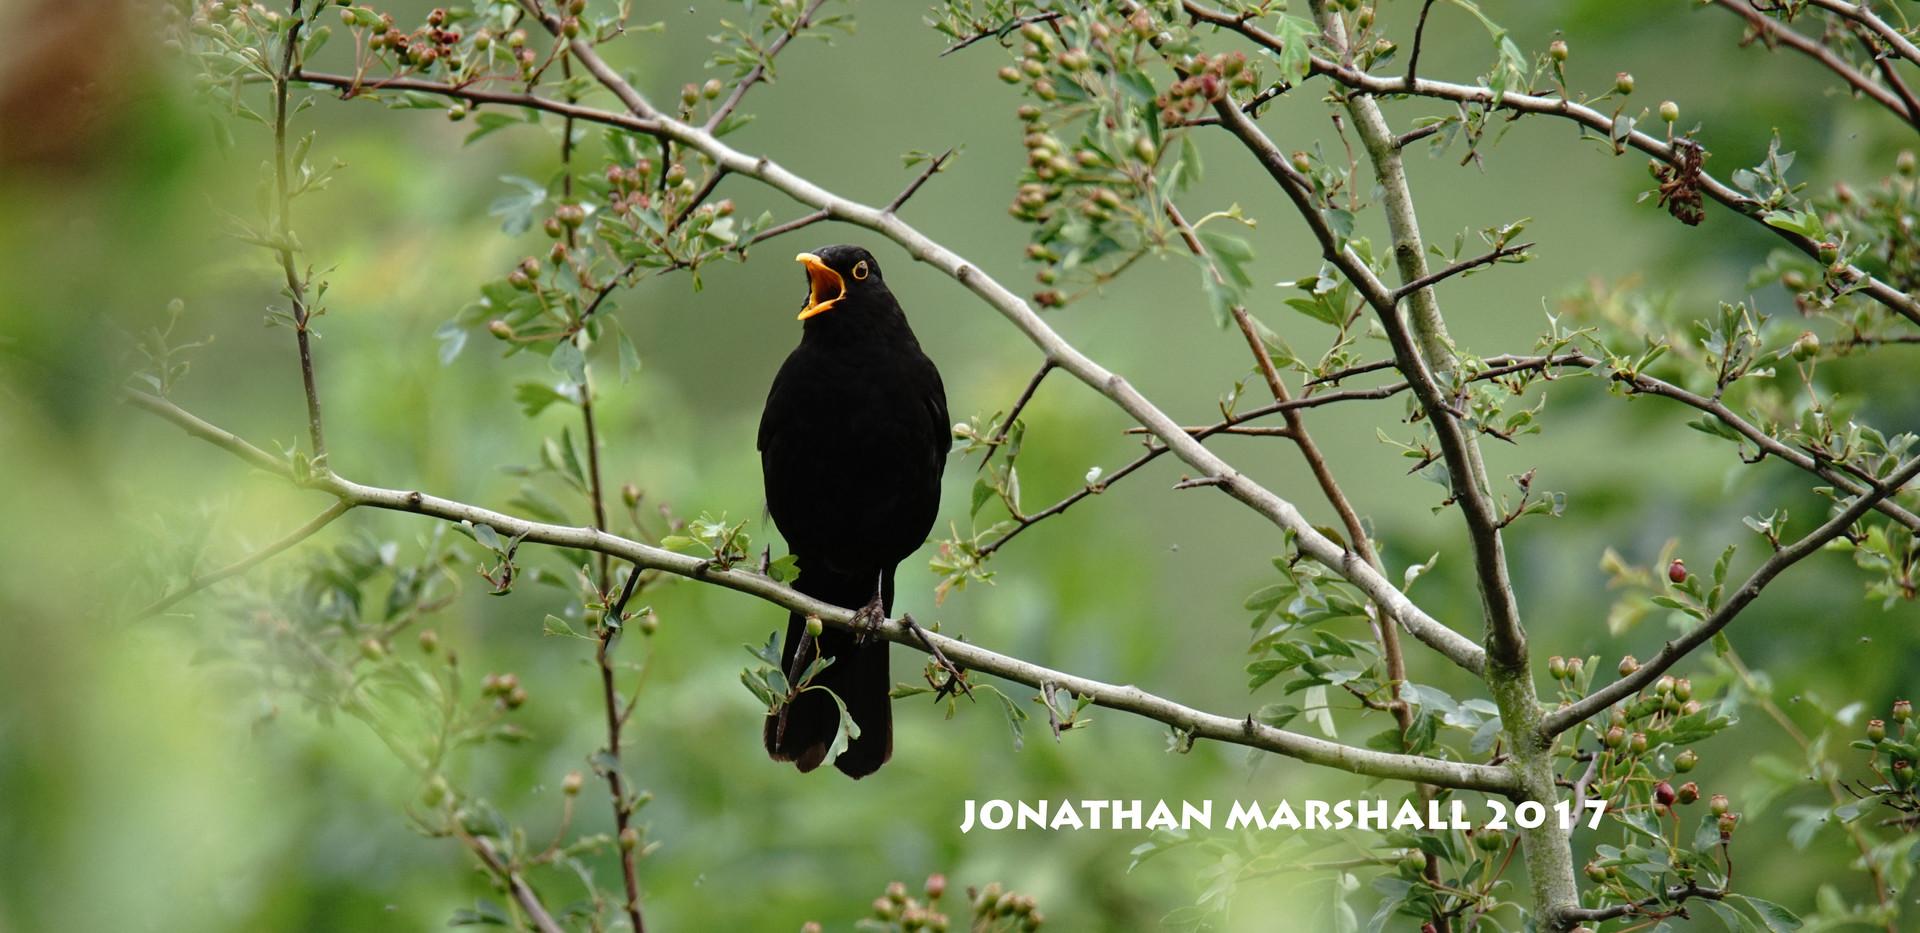 BLACKBIRD003.jpg